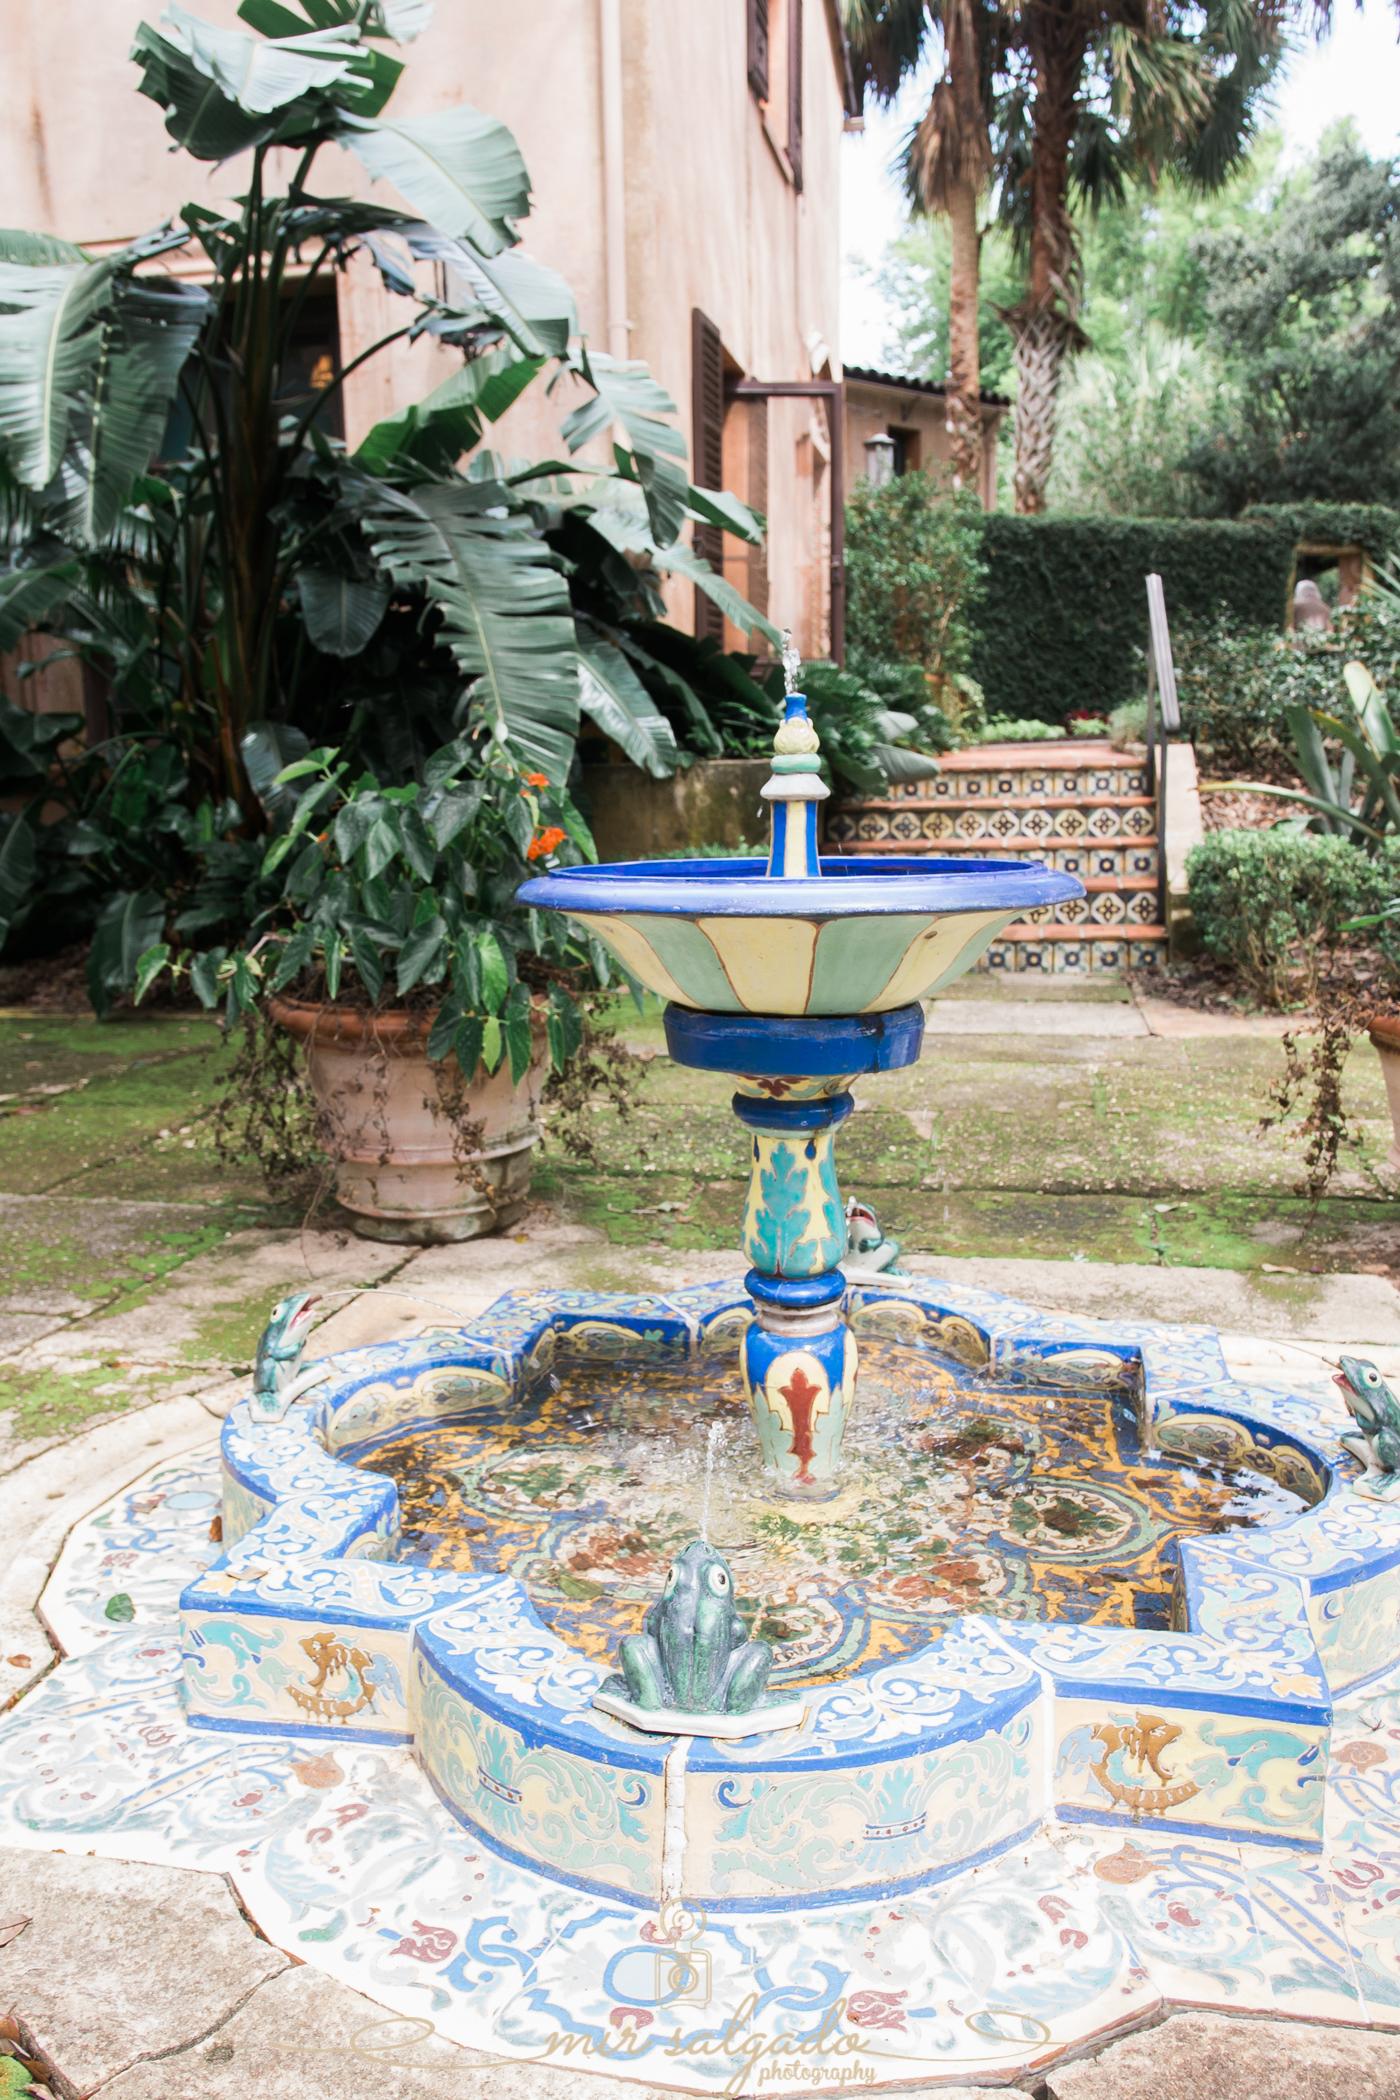 Bok-tower-gardens-wedding, Bok-tower-gardens-Spanish-house